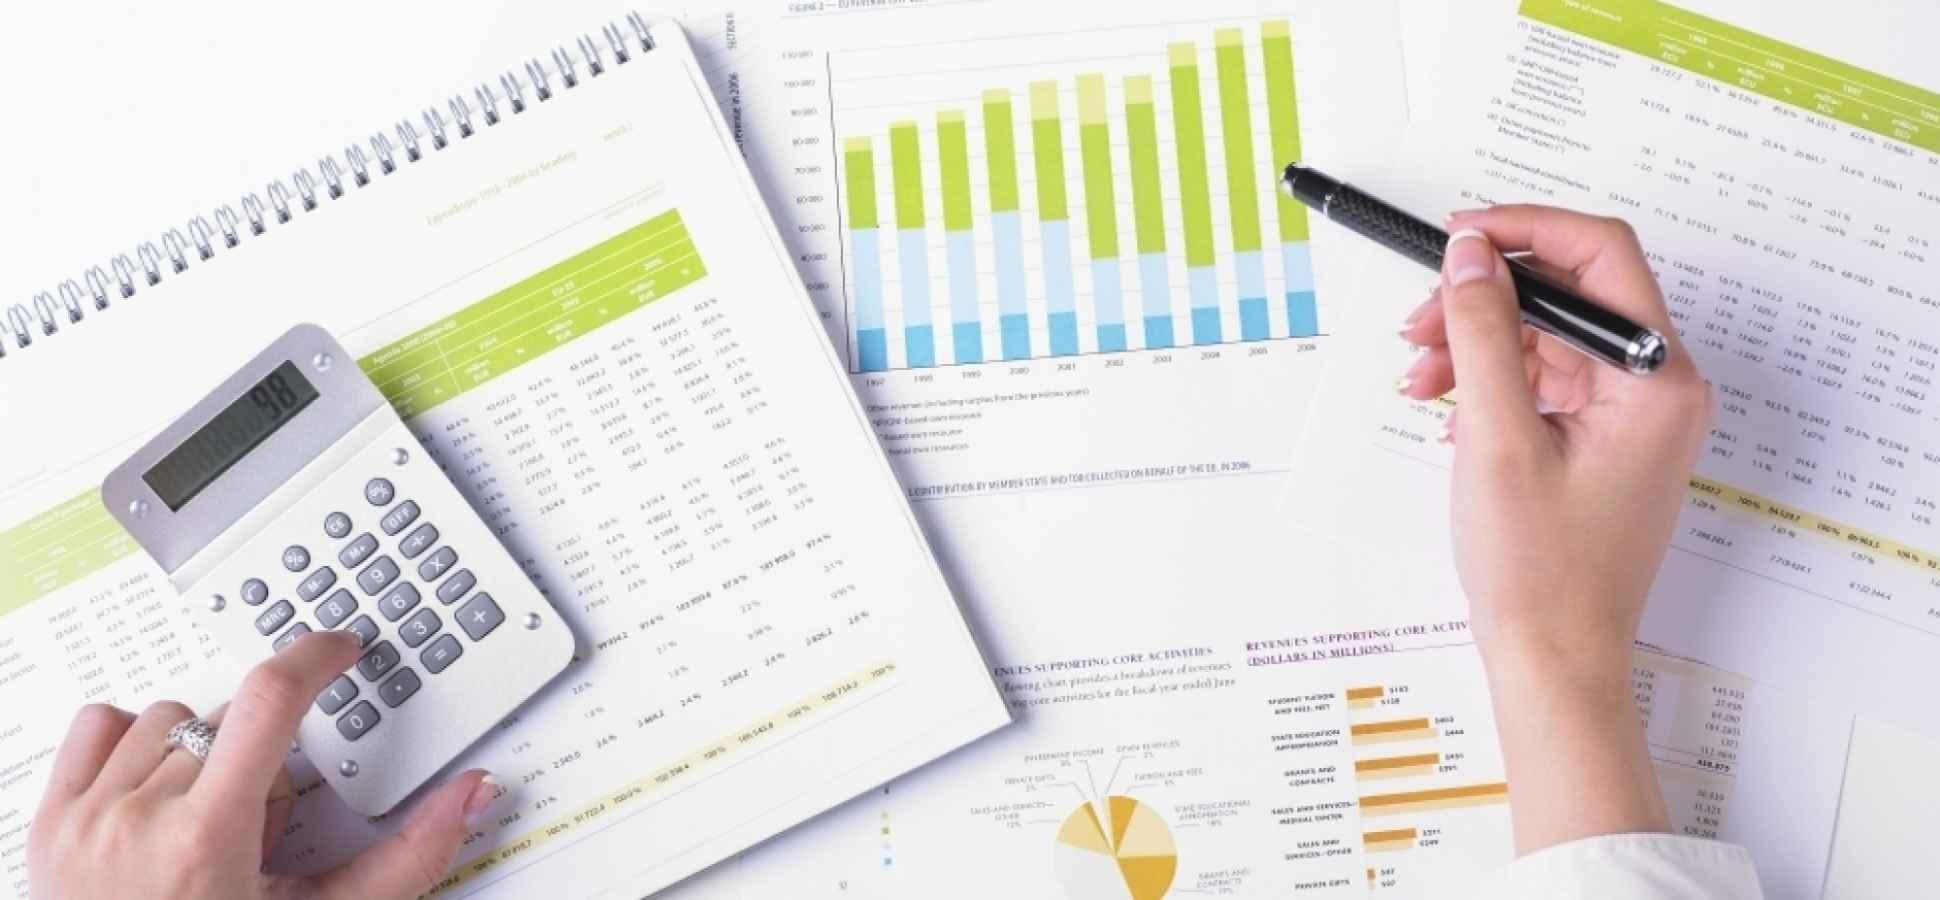 Do financial analysis business plan